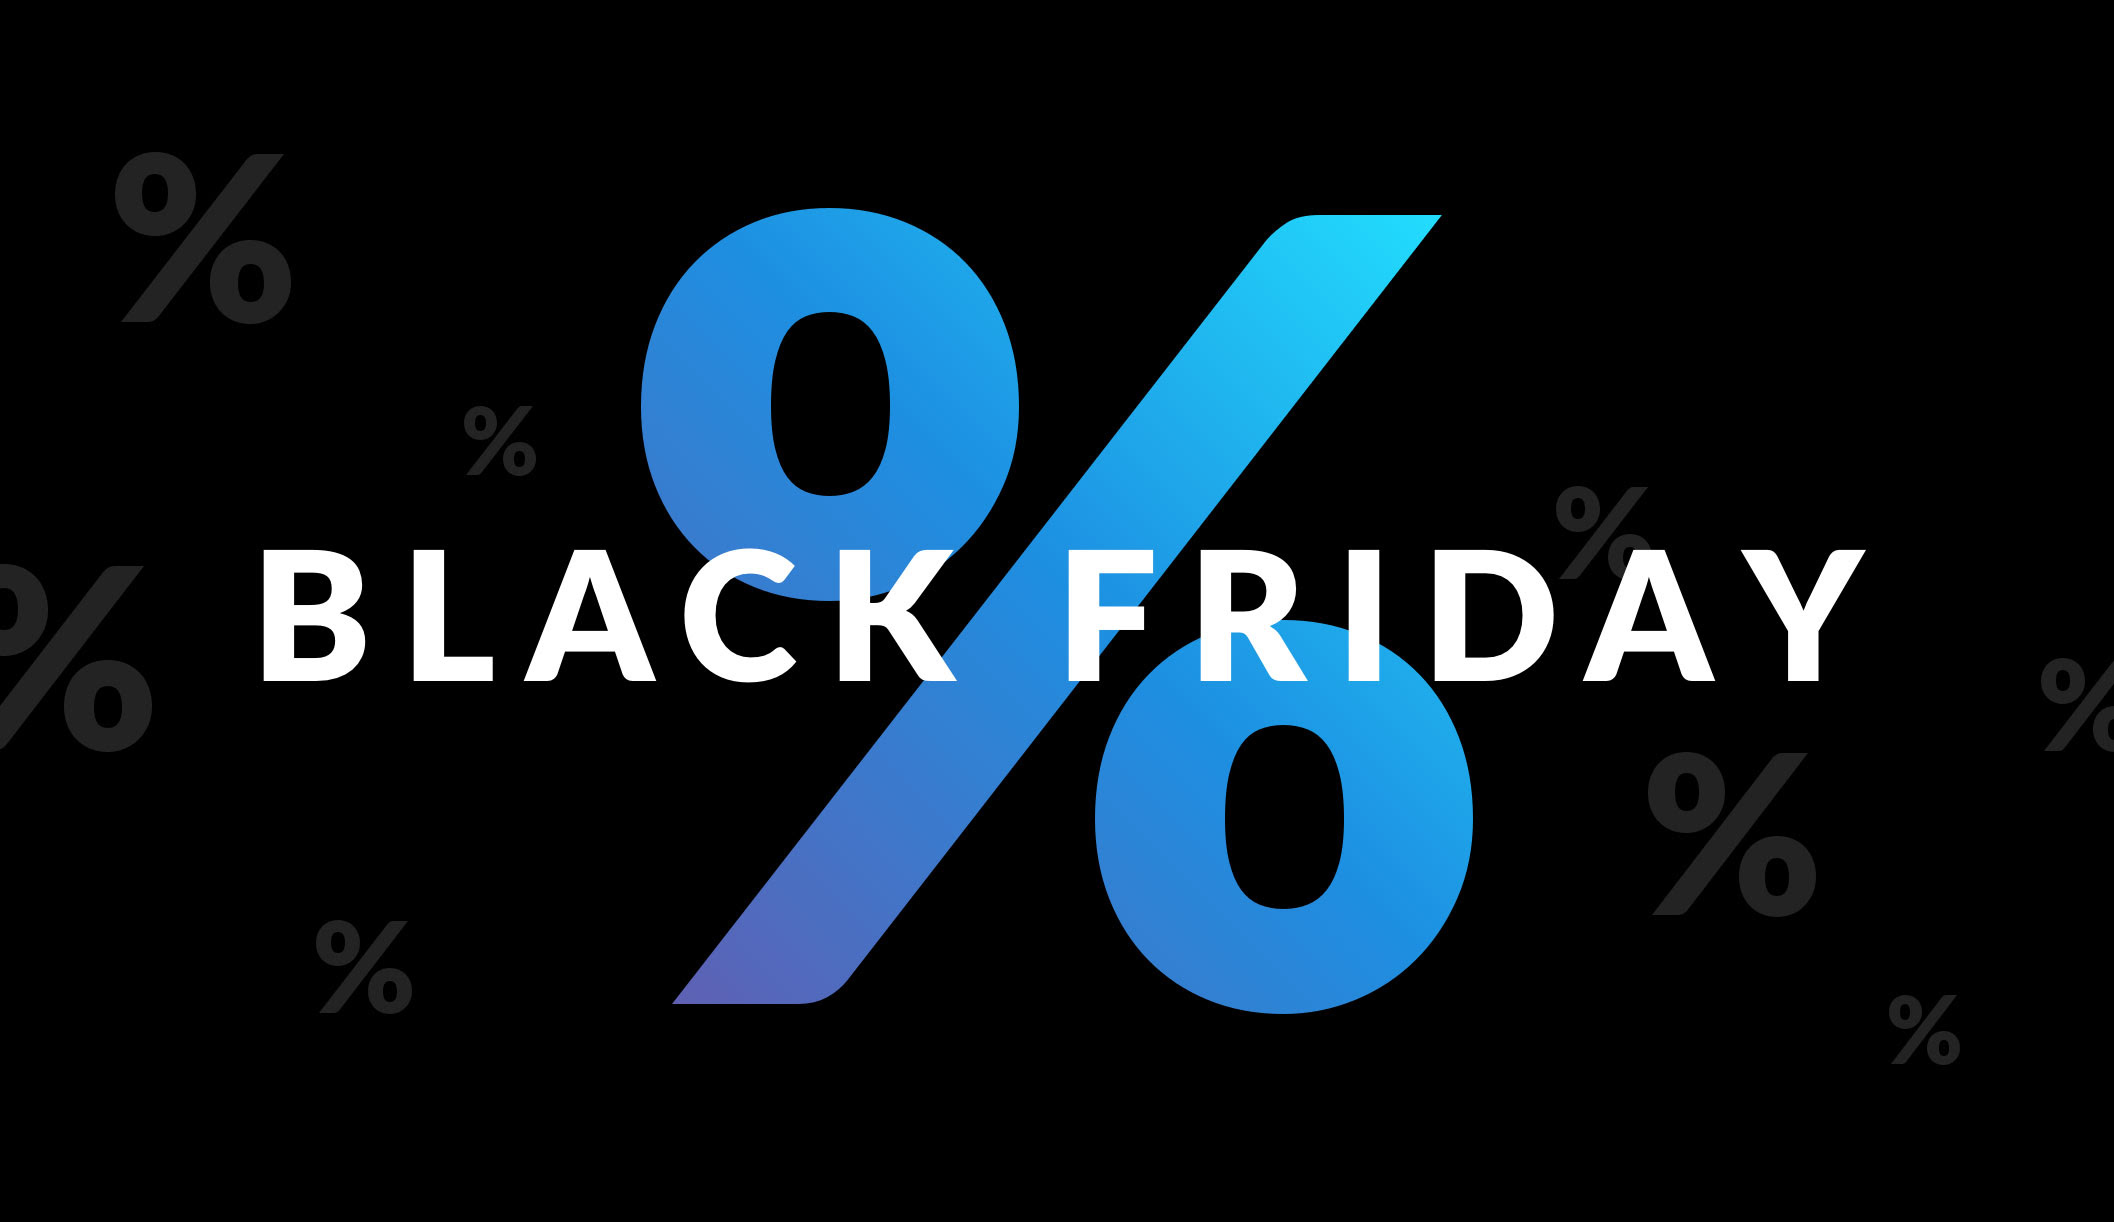 Skyvia Black Friday Special Offer